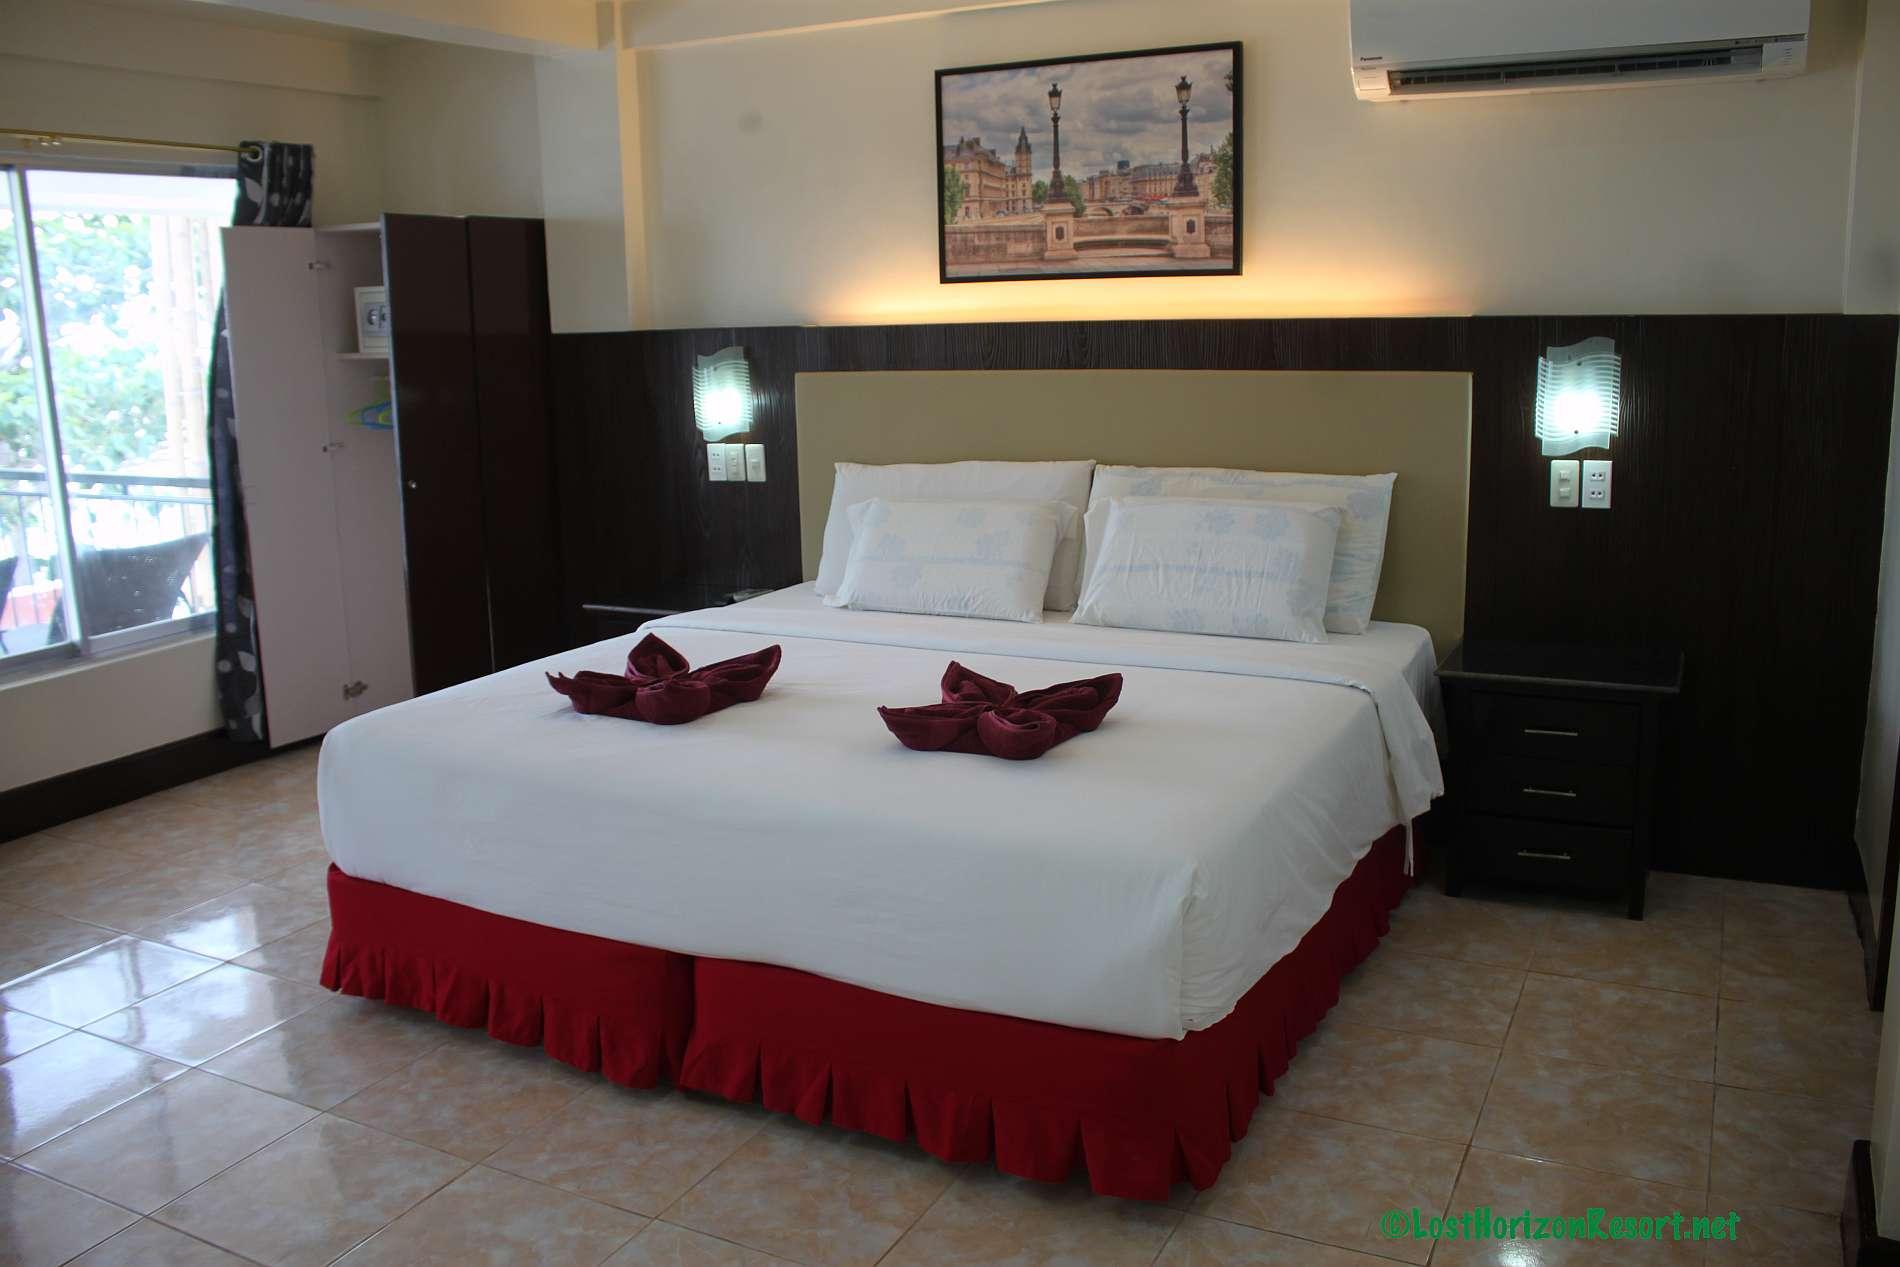 Lost-Horizon-Beach-Resort-Alona-Beach-Panglao-Bohol-Philippines-sun-view-room023